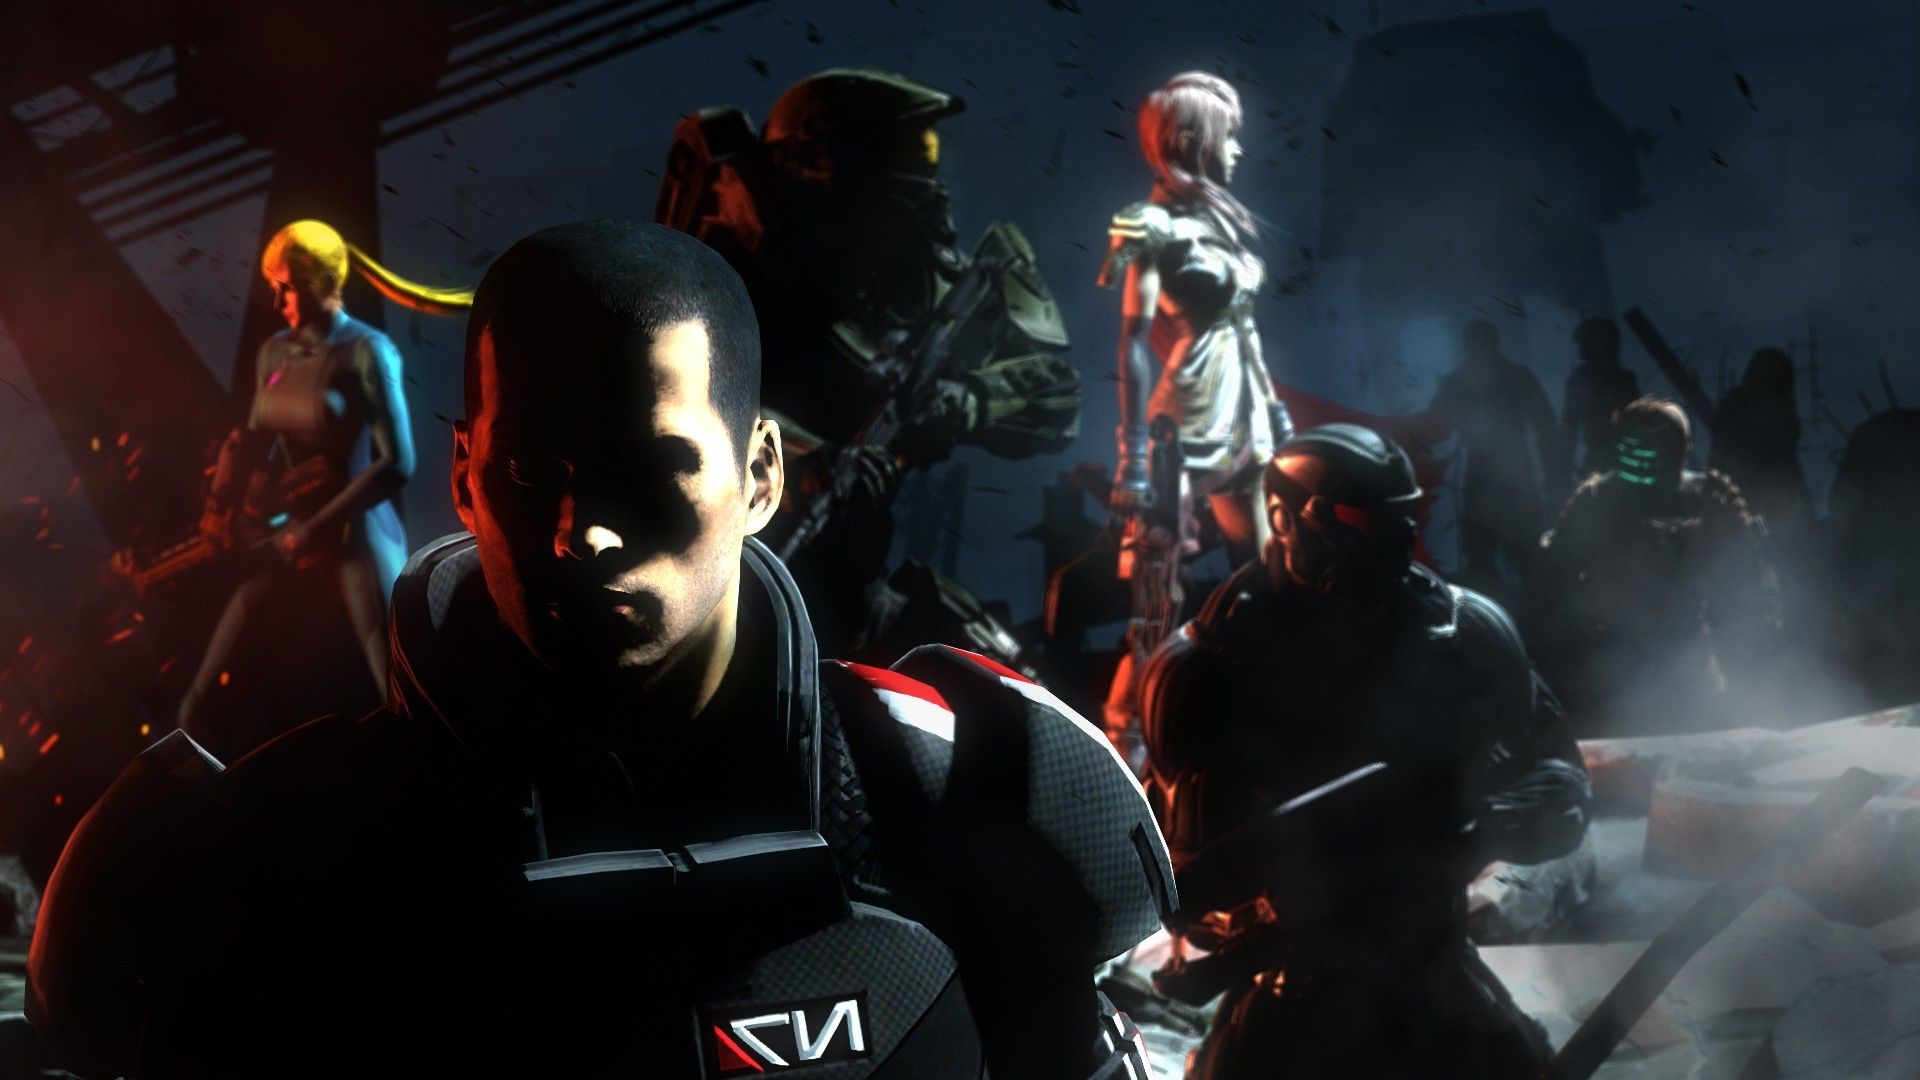 Mass Effect 3, Halo, Samus Aran, Final Fantasy XIII, Dead Space Wallpapers  HD / Desktop and Mobile Backgrounds